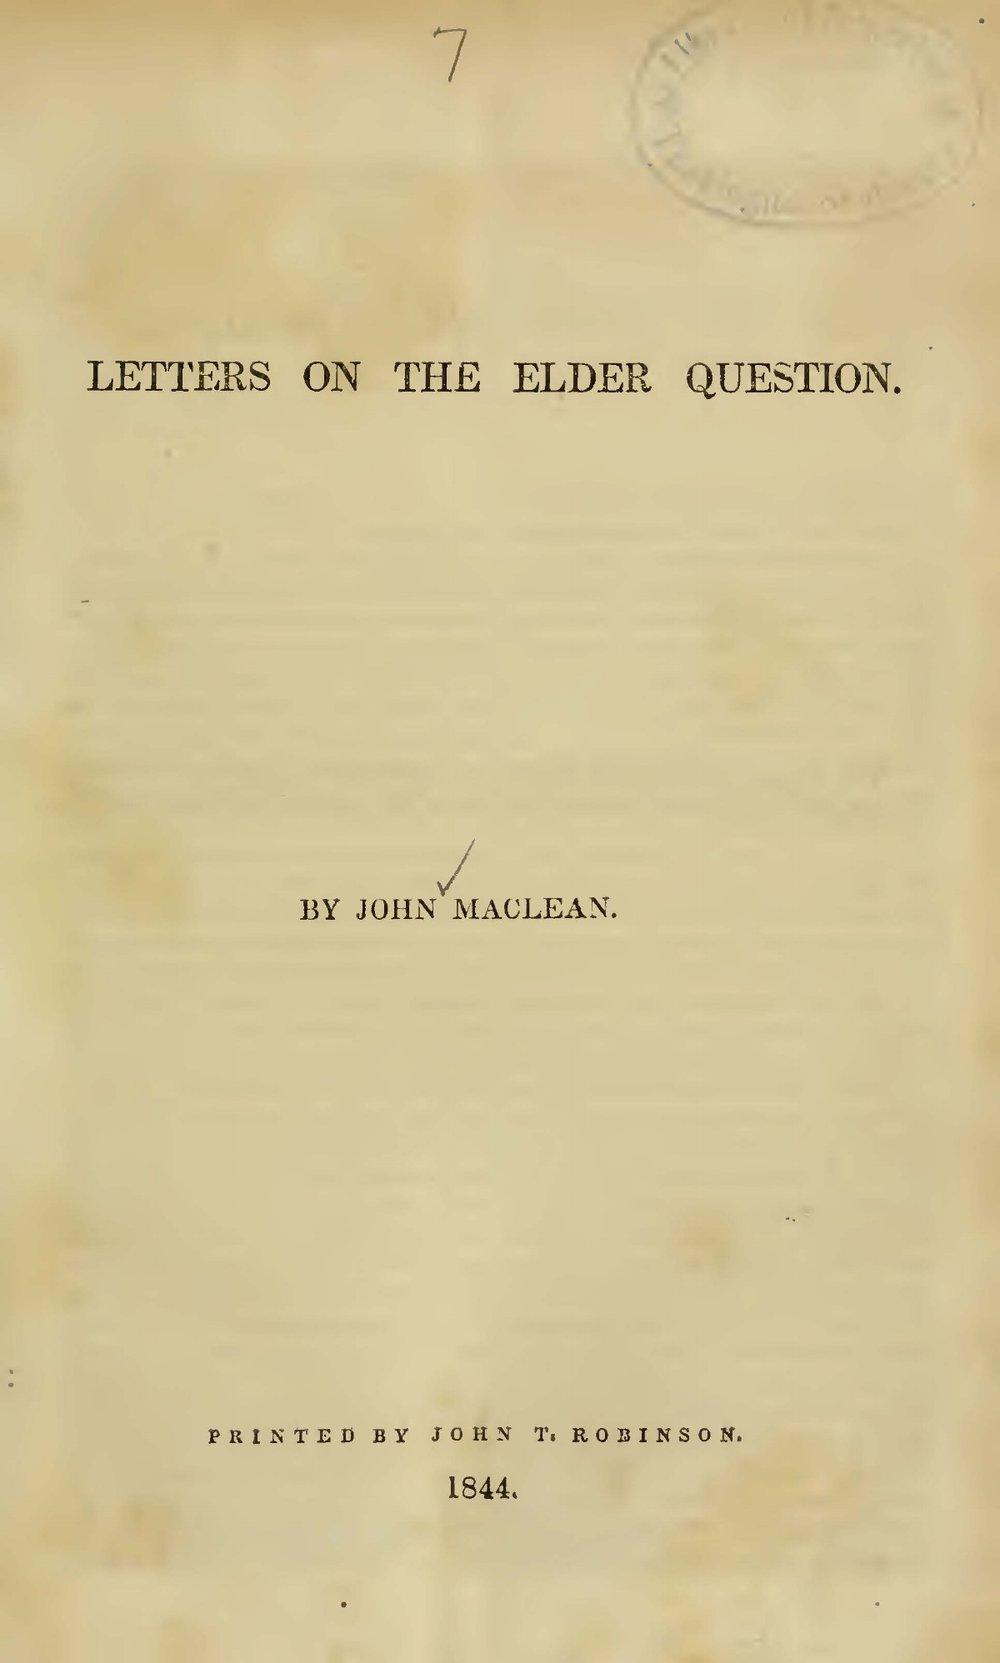 Maclean, John, Jr., Letters on the Elder Question Title Page.jpg